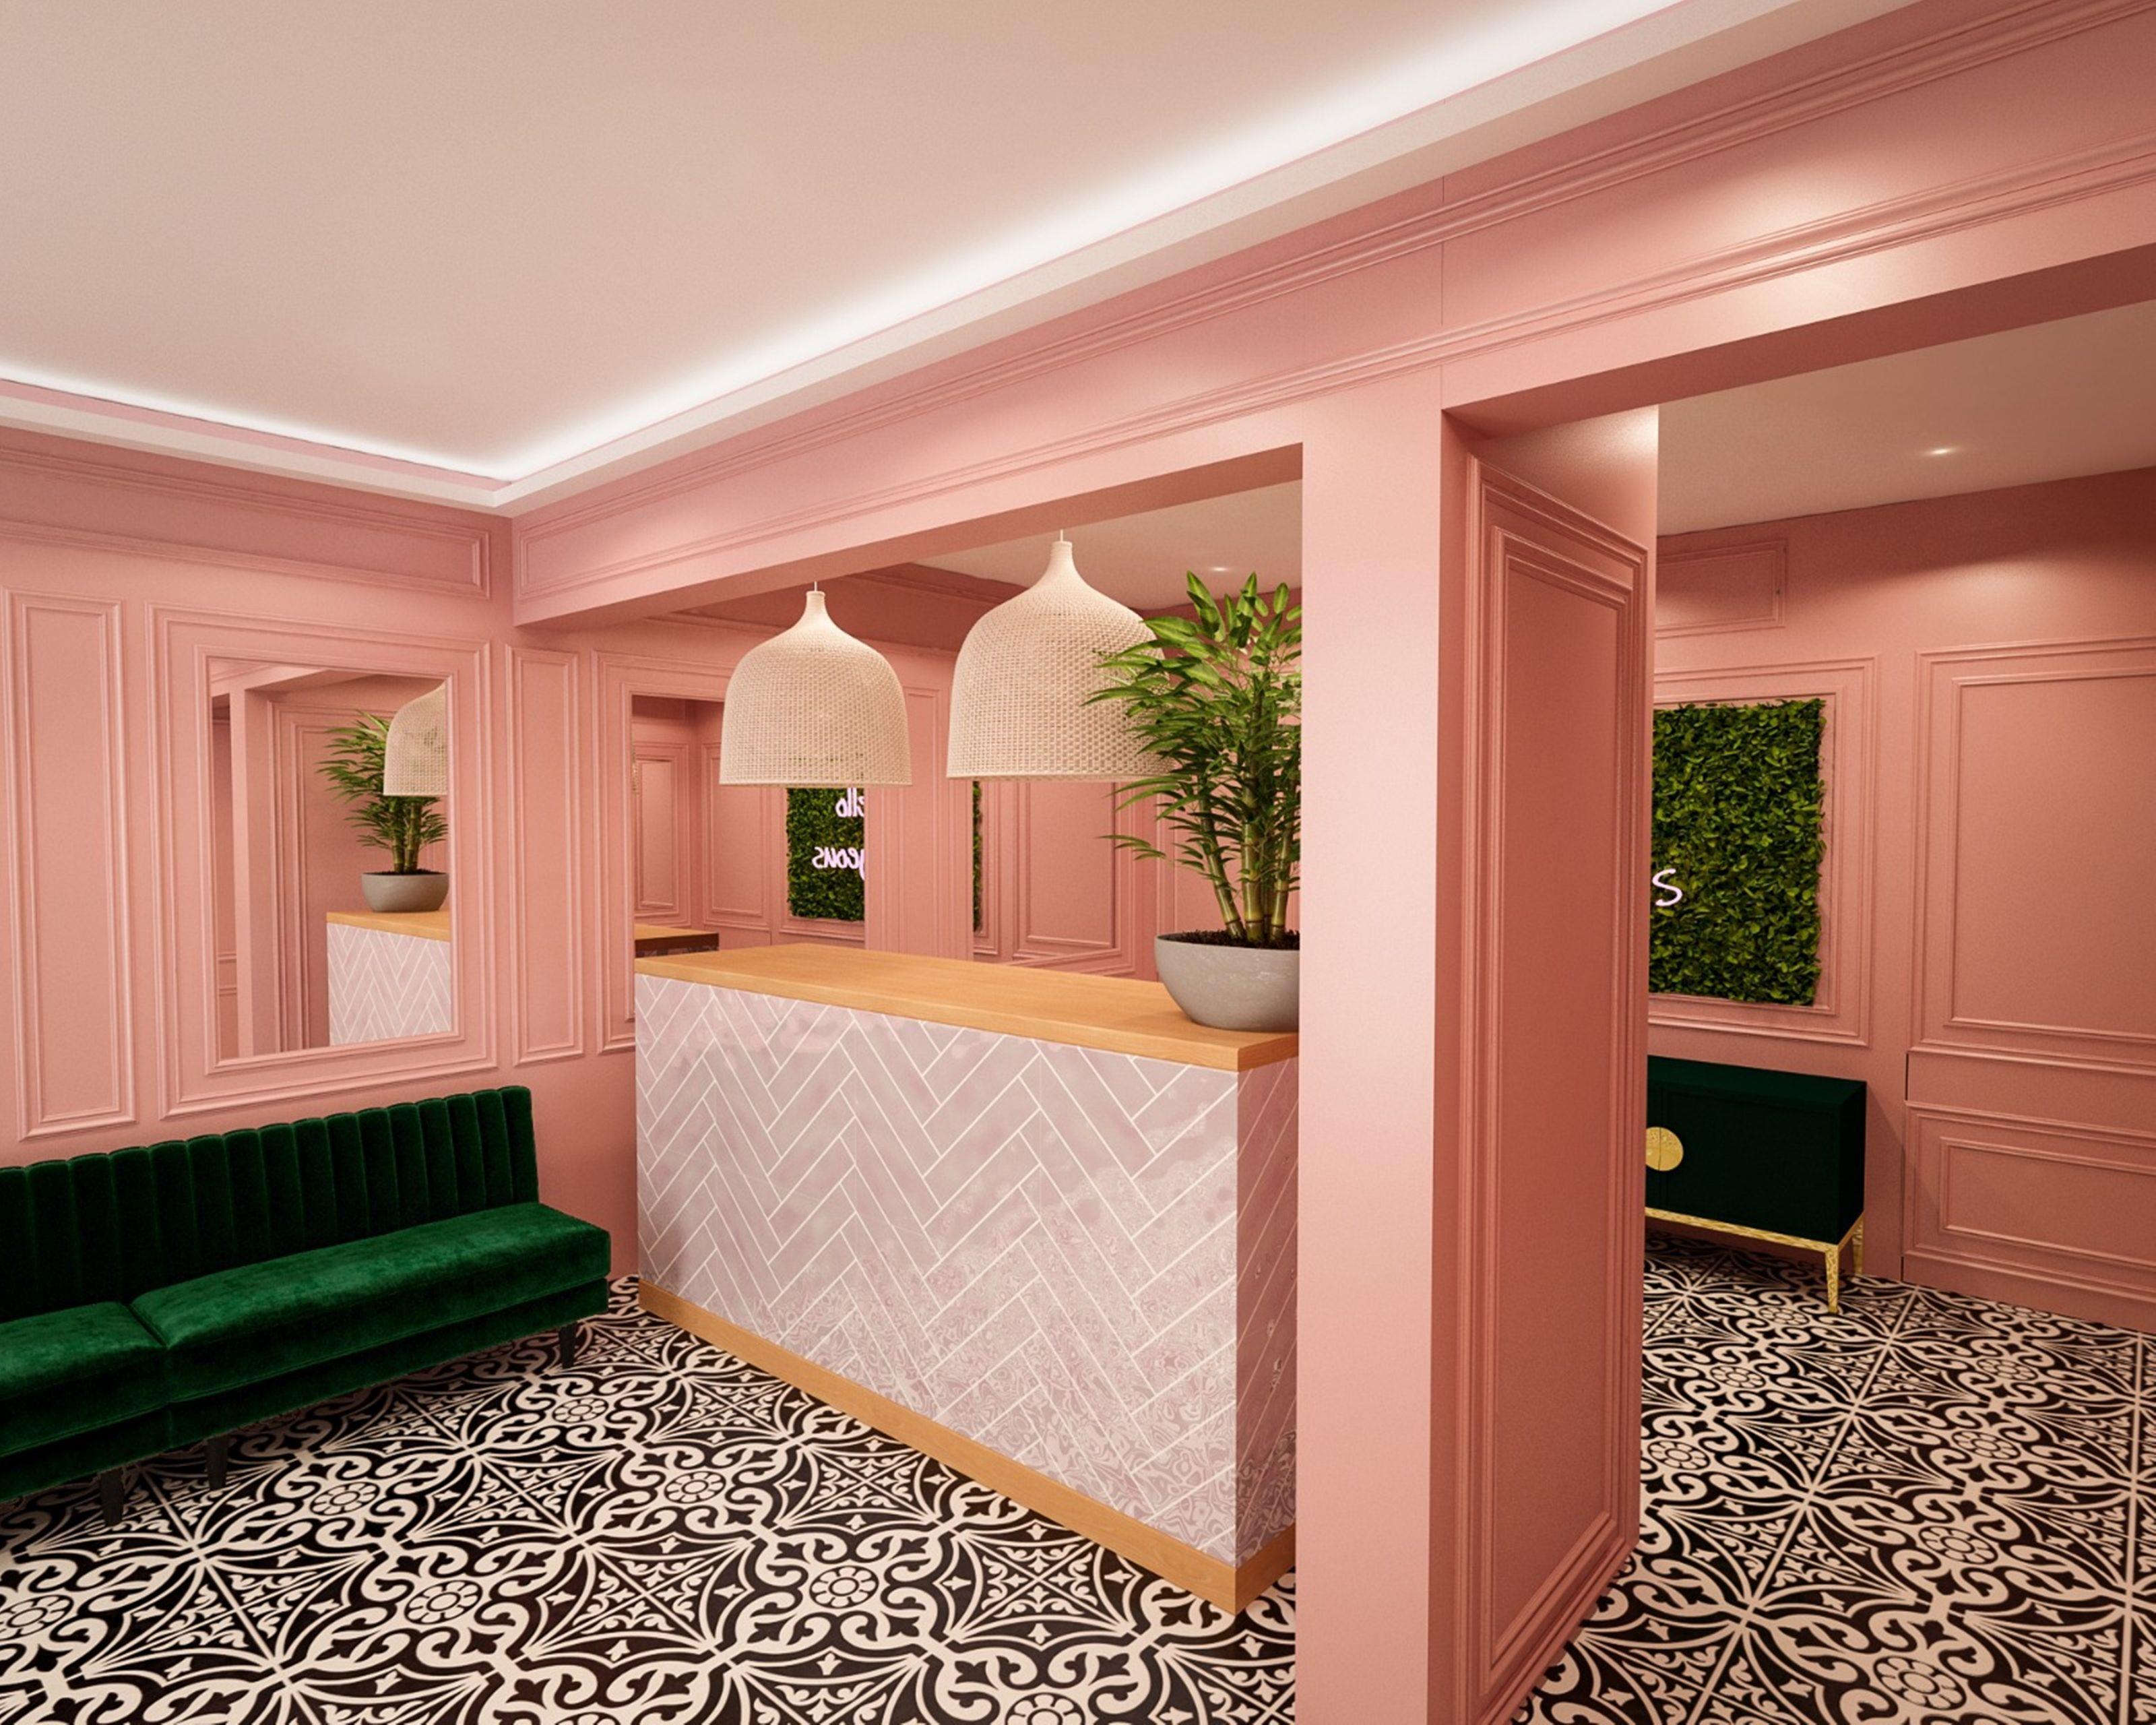 http://www.orextravel.sk/OREX/hotelphotos/anjeliq-downtown-hotel-general-0047.jpg